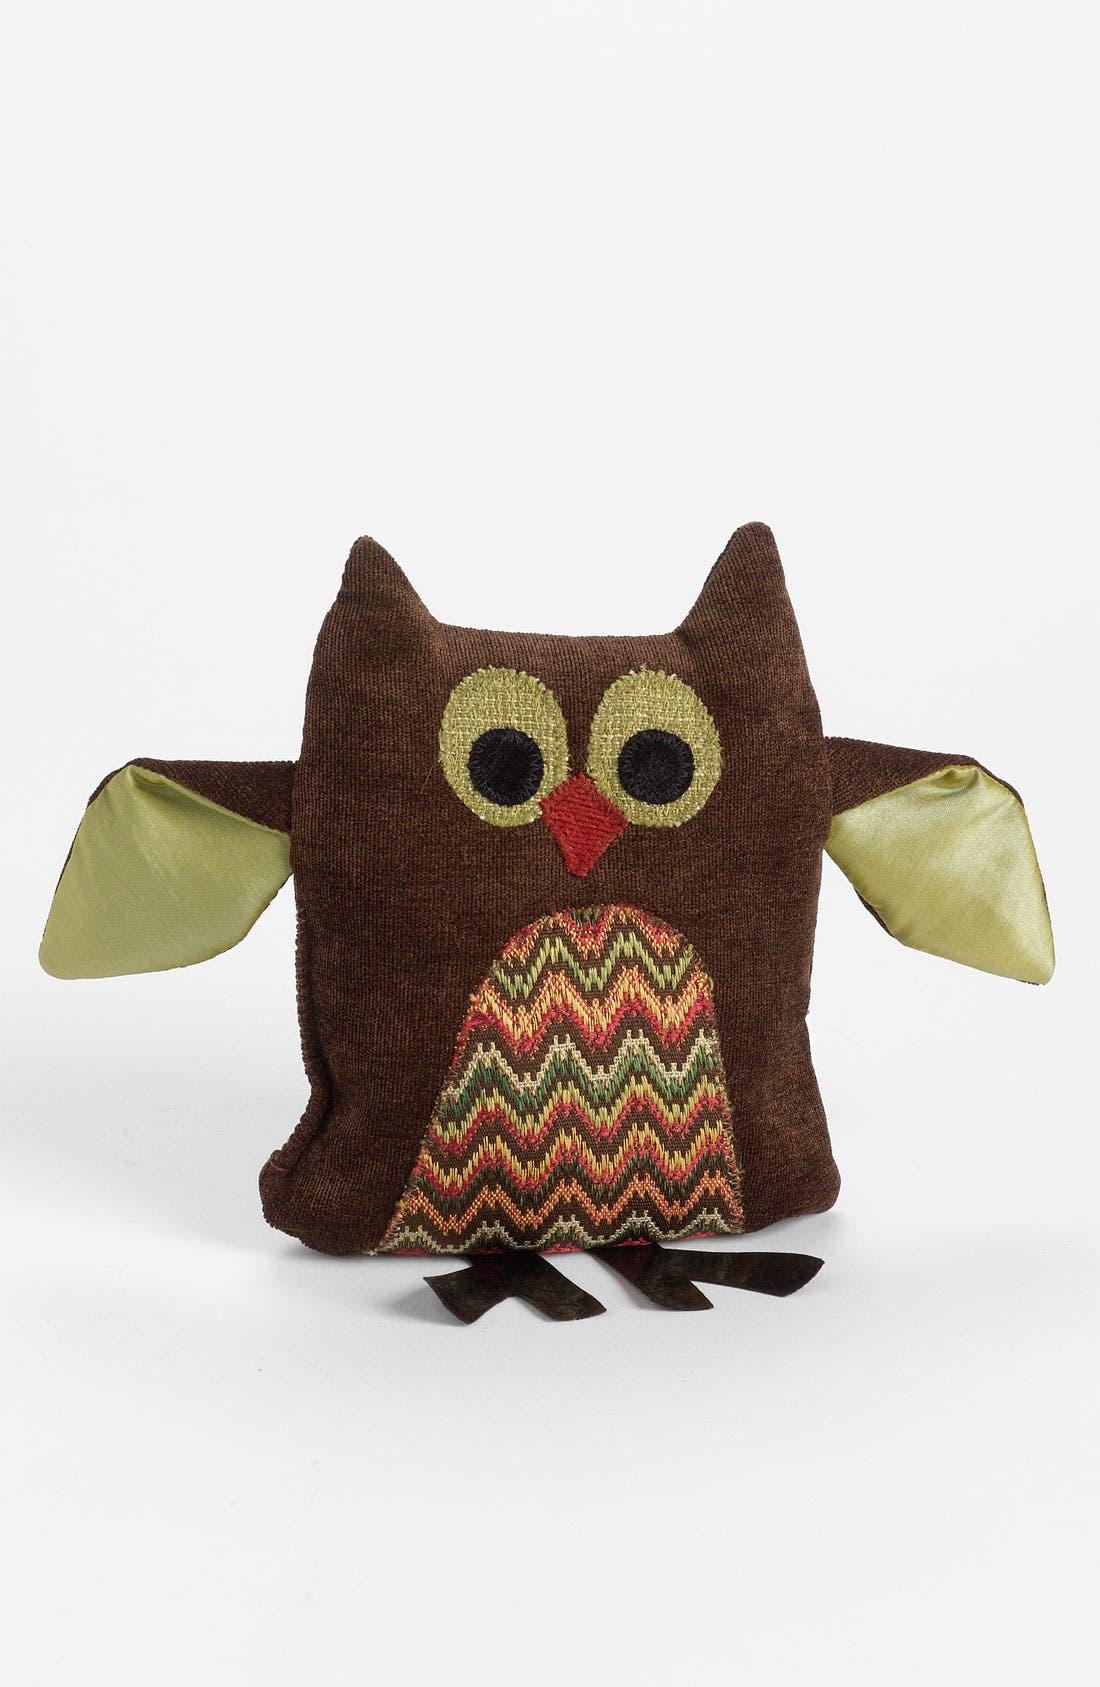 Main Image - Woof & Poof Chevron Pattern Owl Decoration